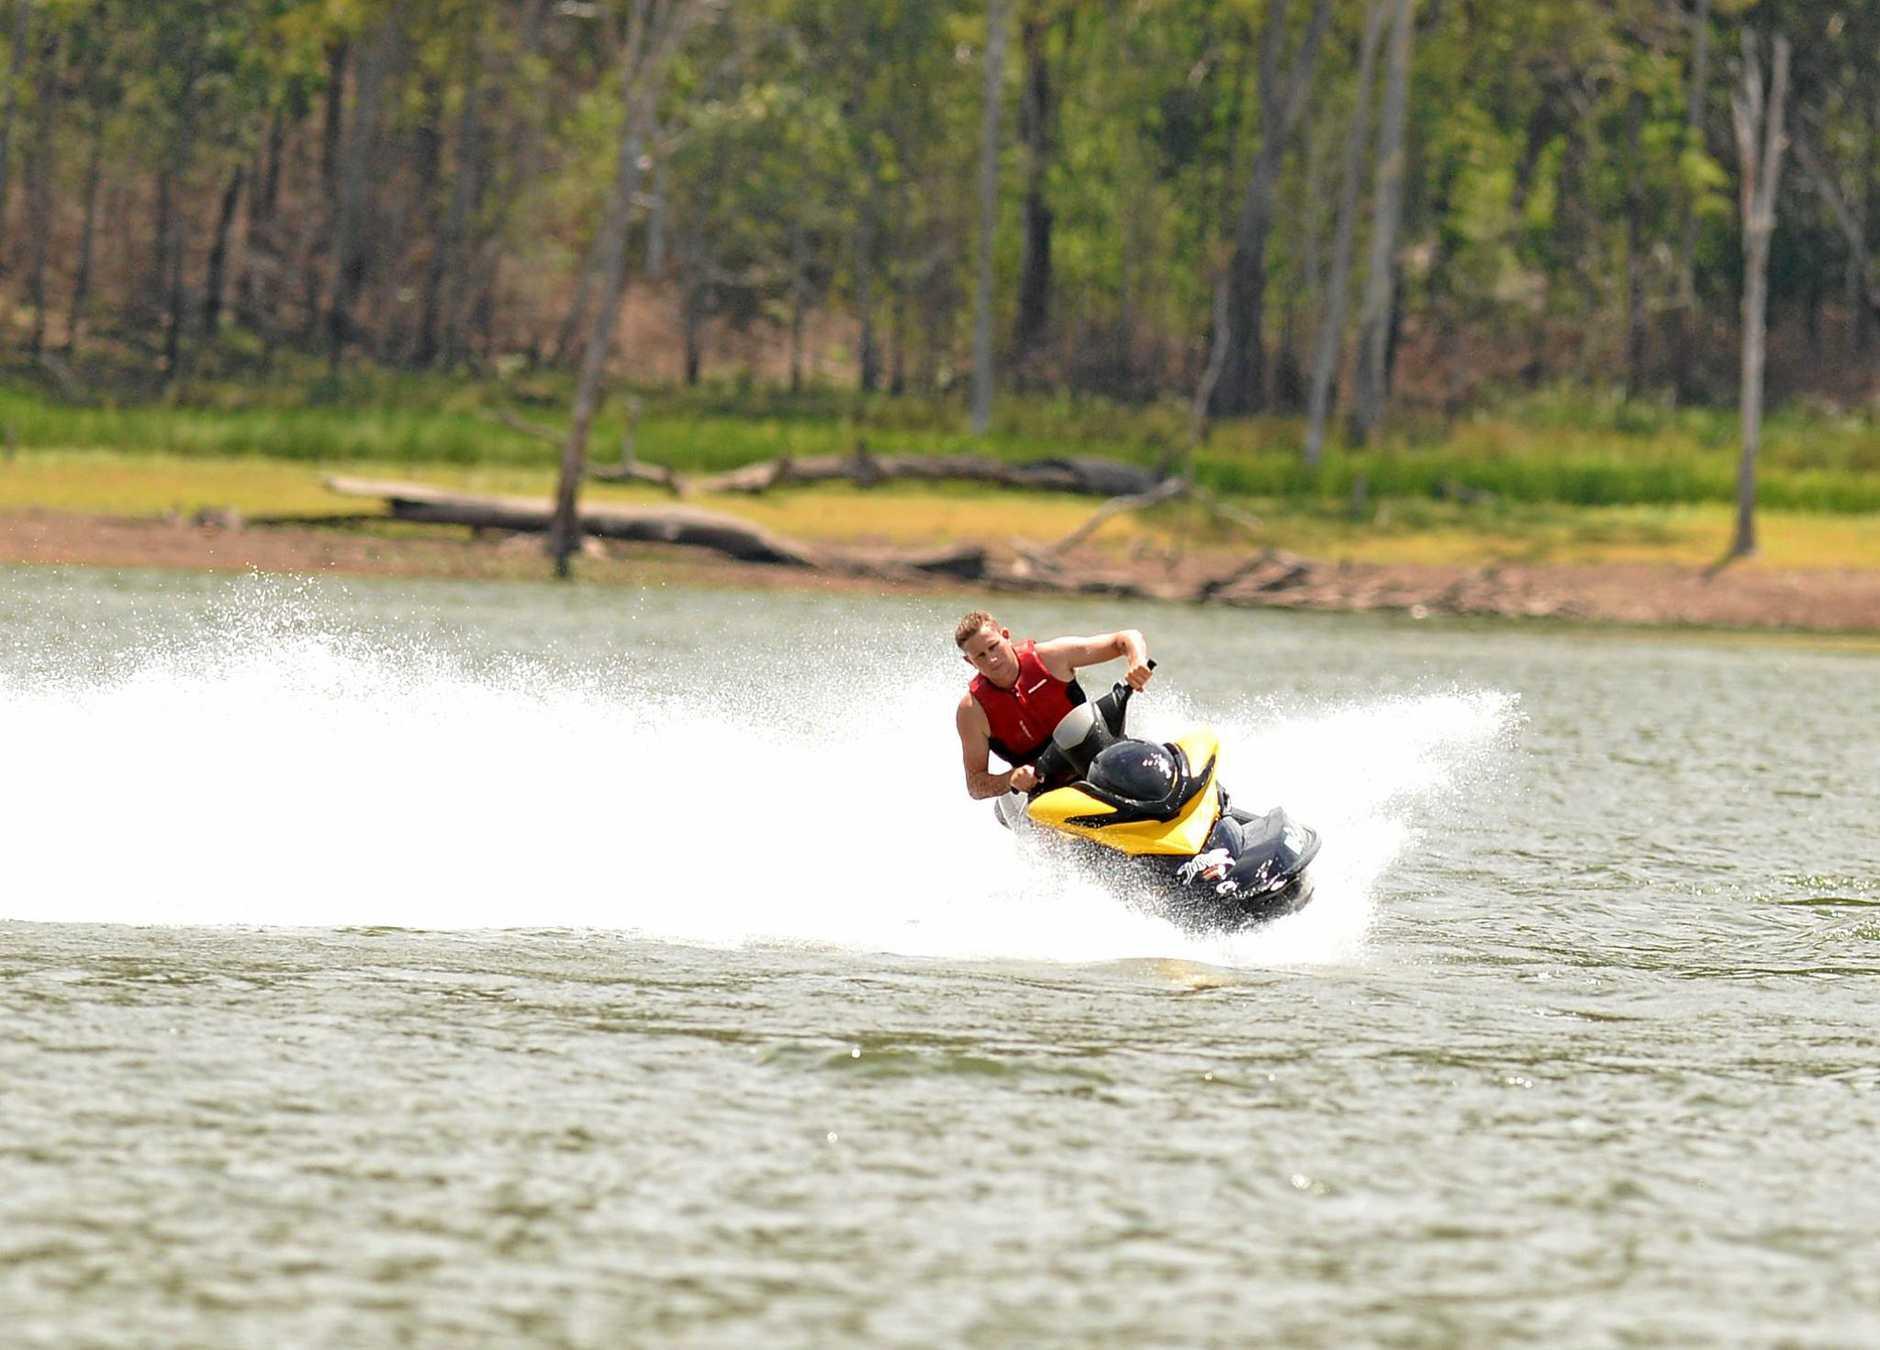 Brett Paulger on his jet ski at Borumba dam.